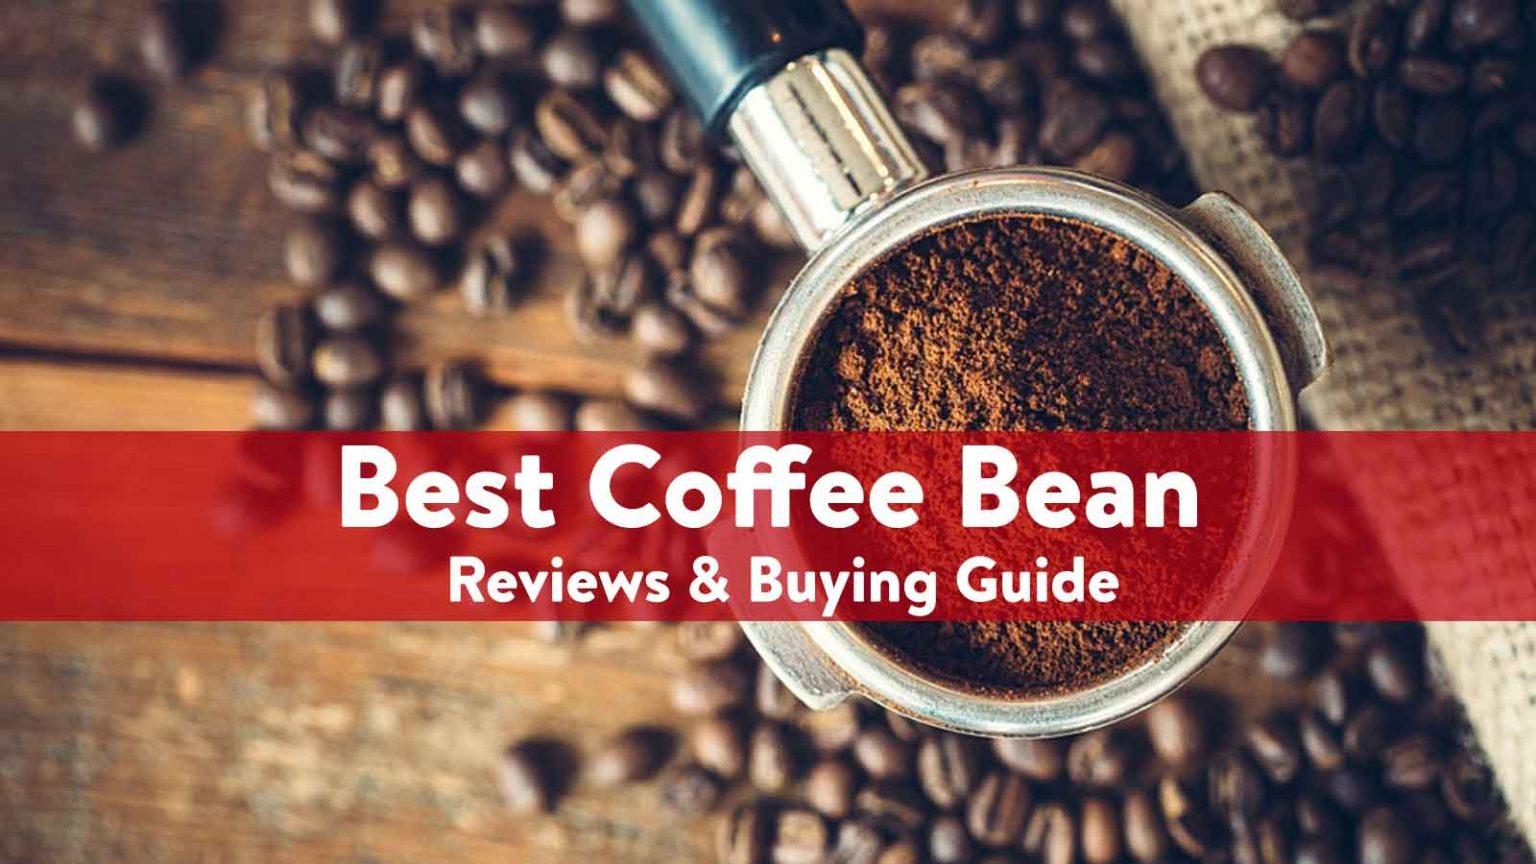 Best Coffee Bean